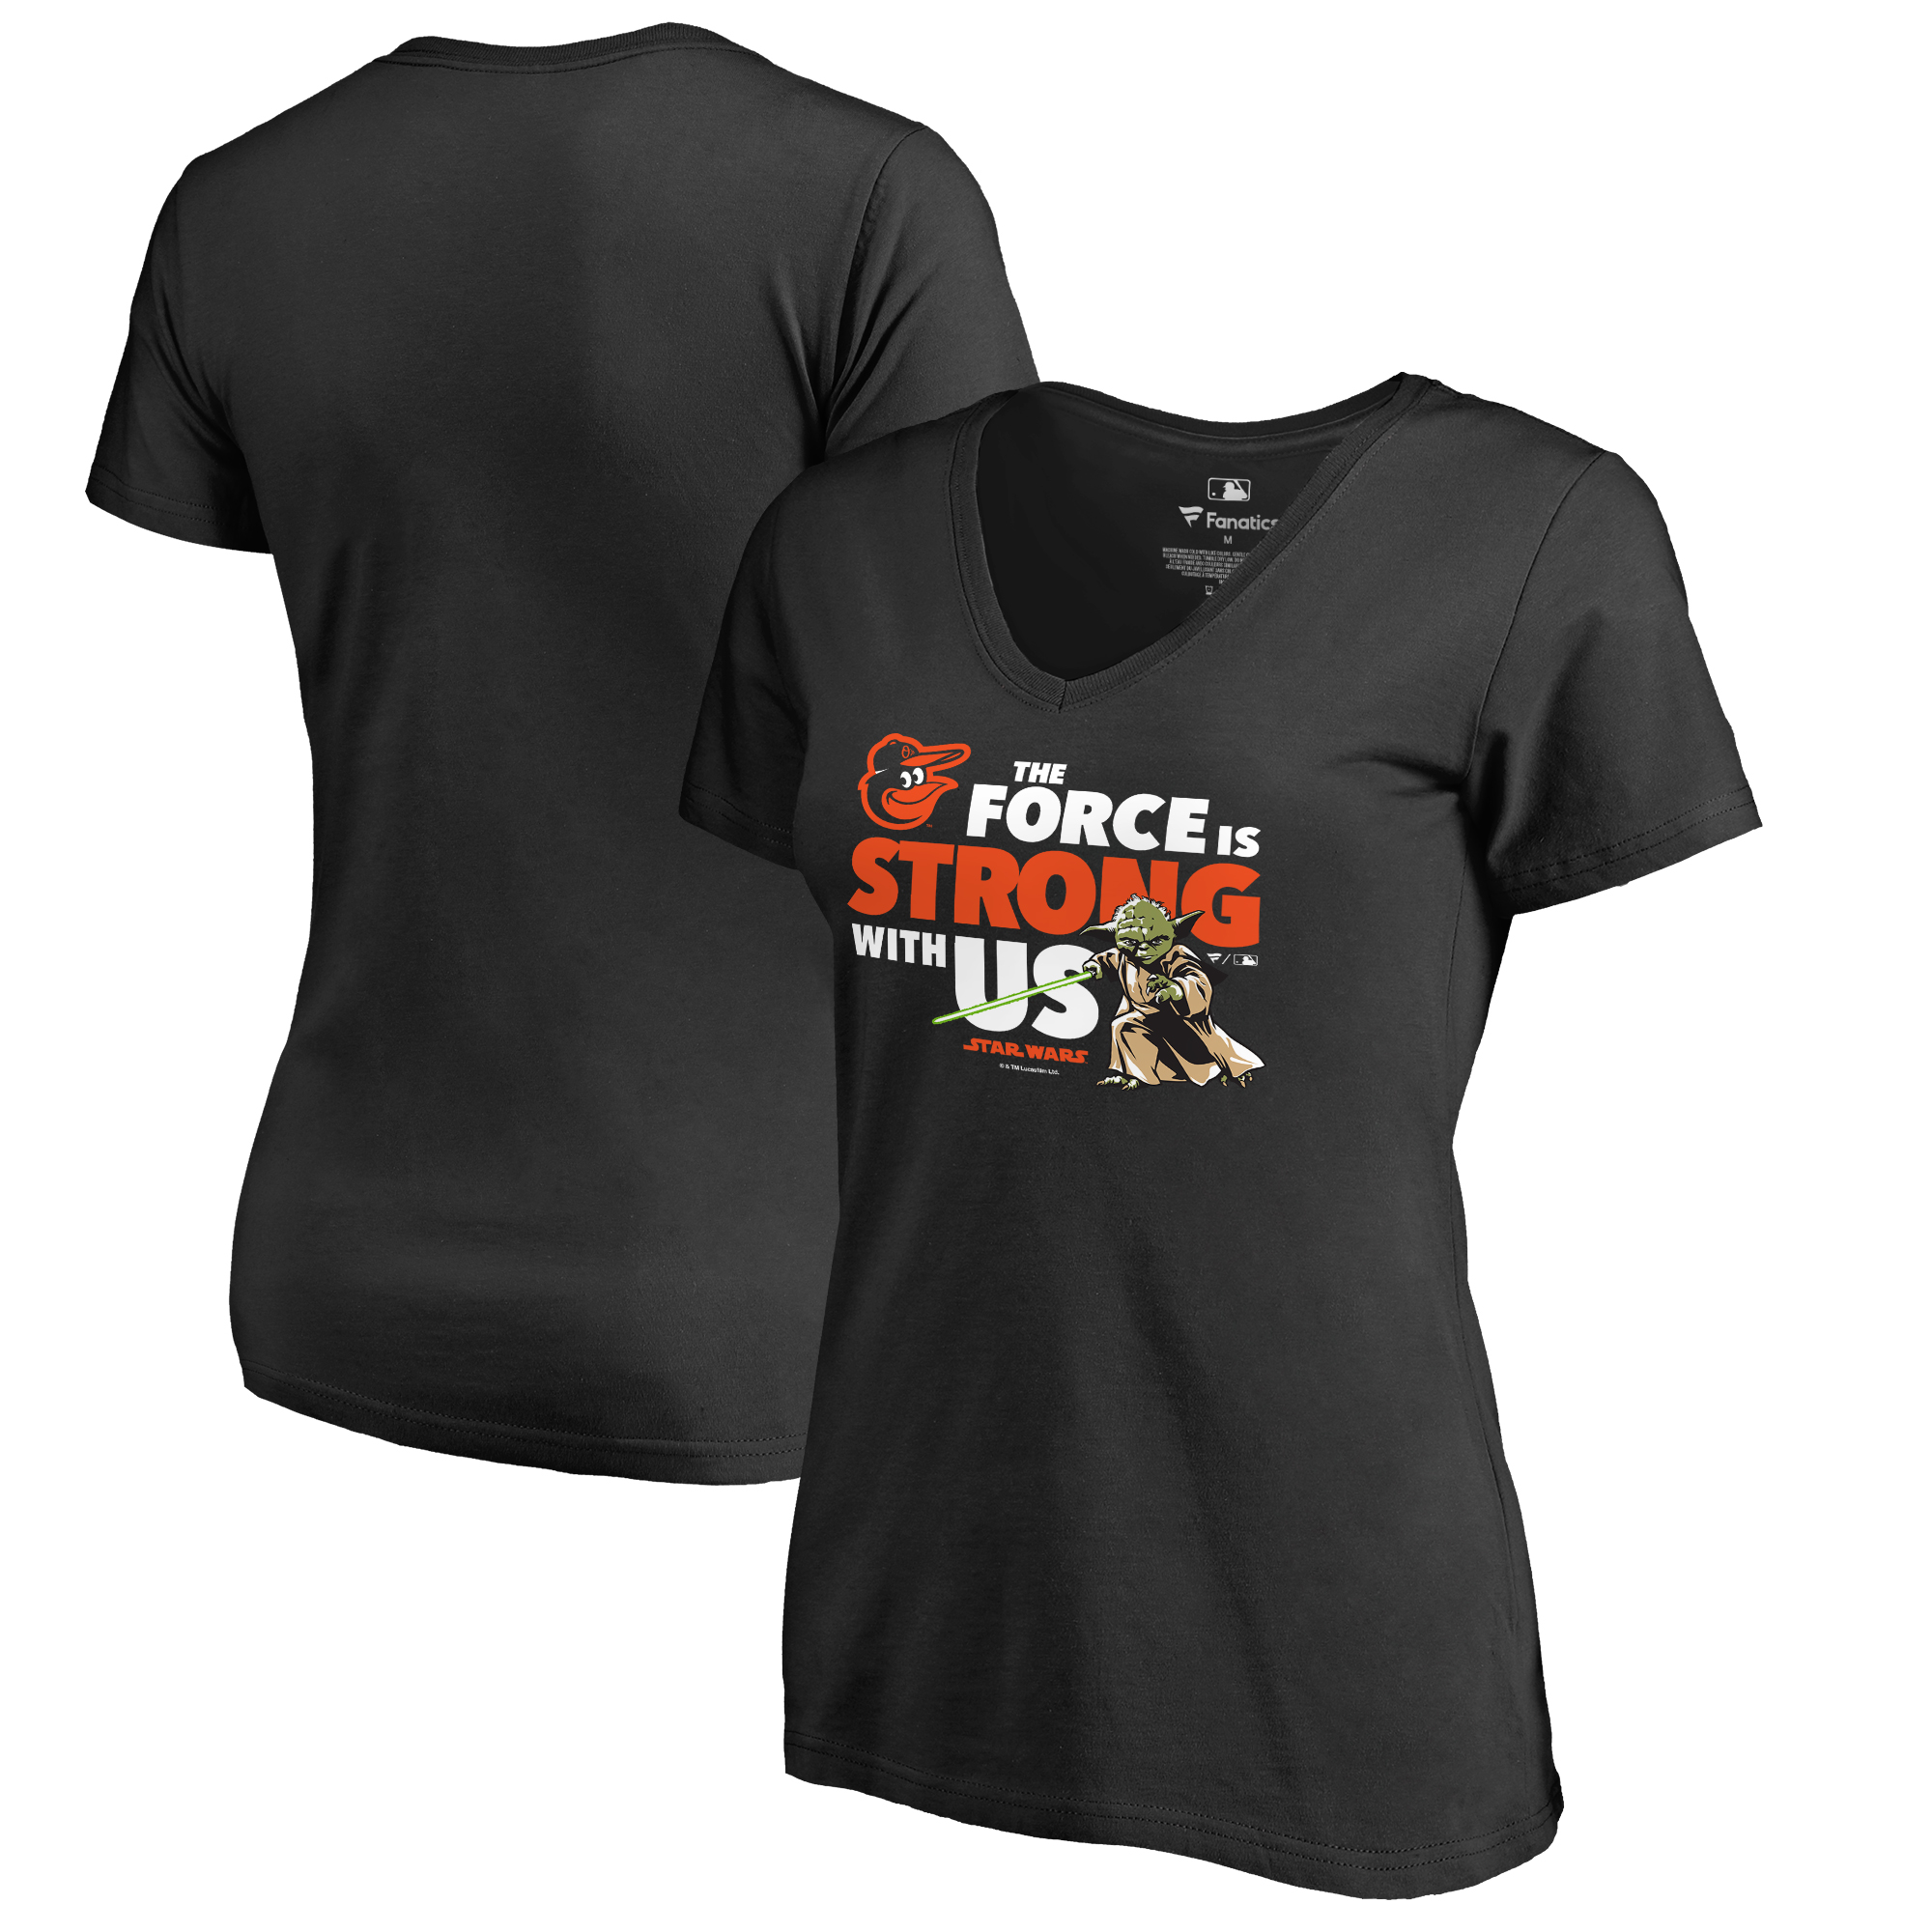 Baltimore Orioles Fanatics Branded Women's Star Wars Jedi Strong V-Neck T-Shirt - Black